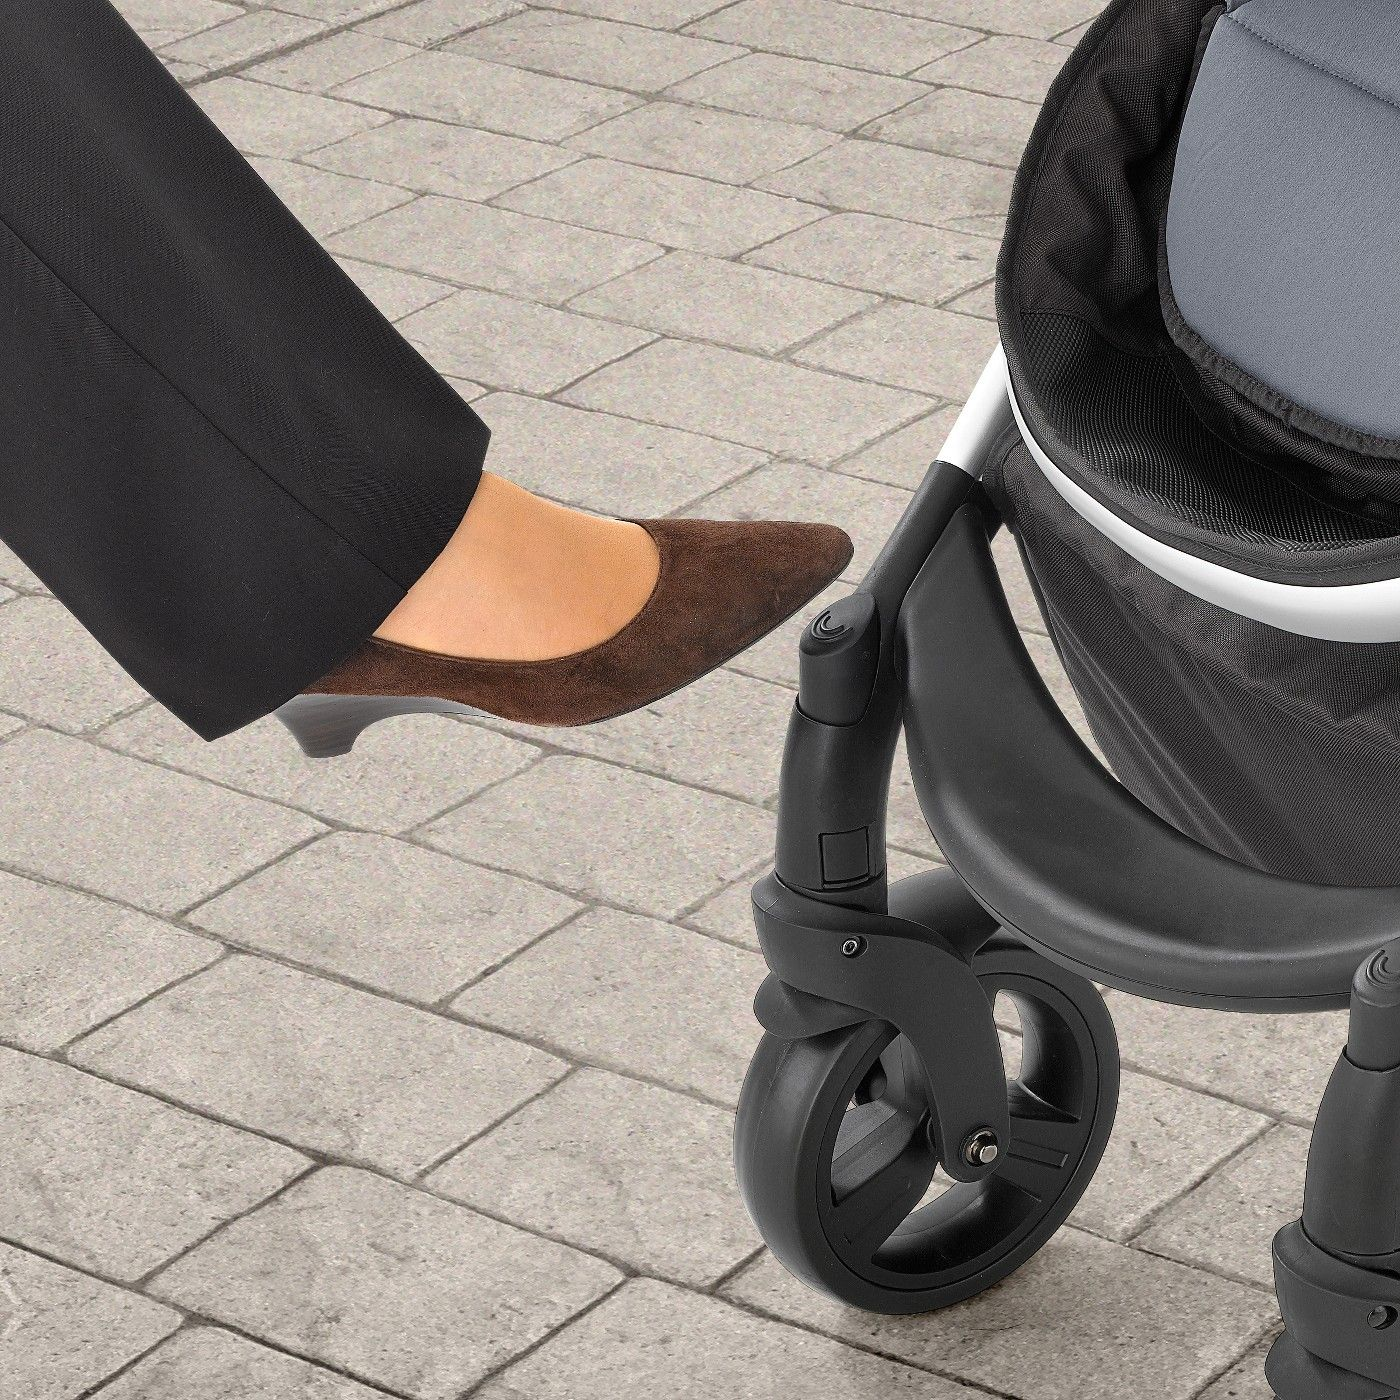 Chicco Urban Stroller Minerale Affiliate Urban,